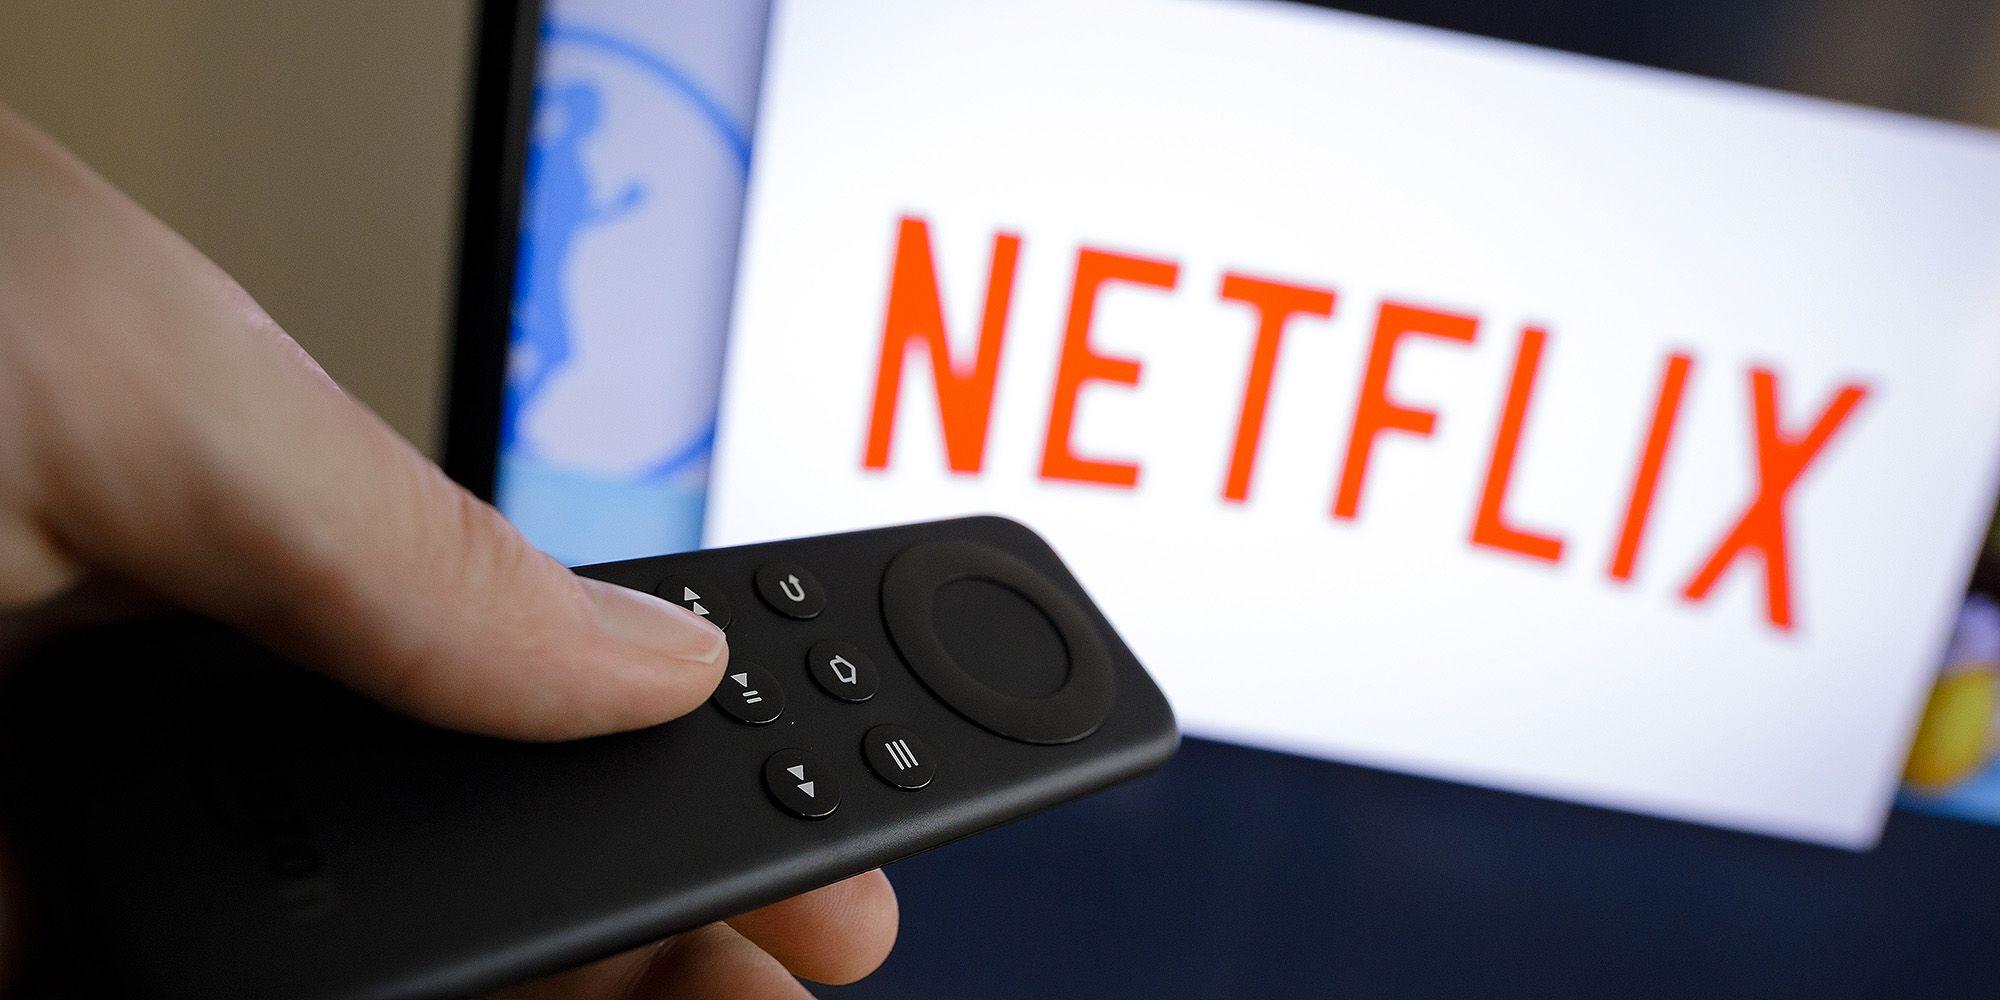 Netflix Support Number